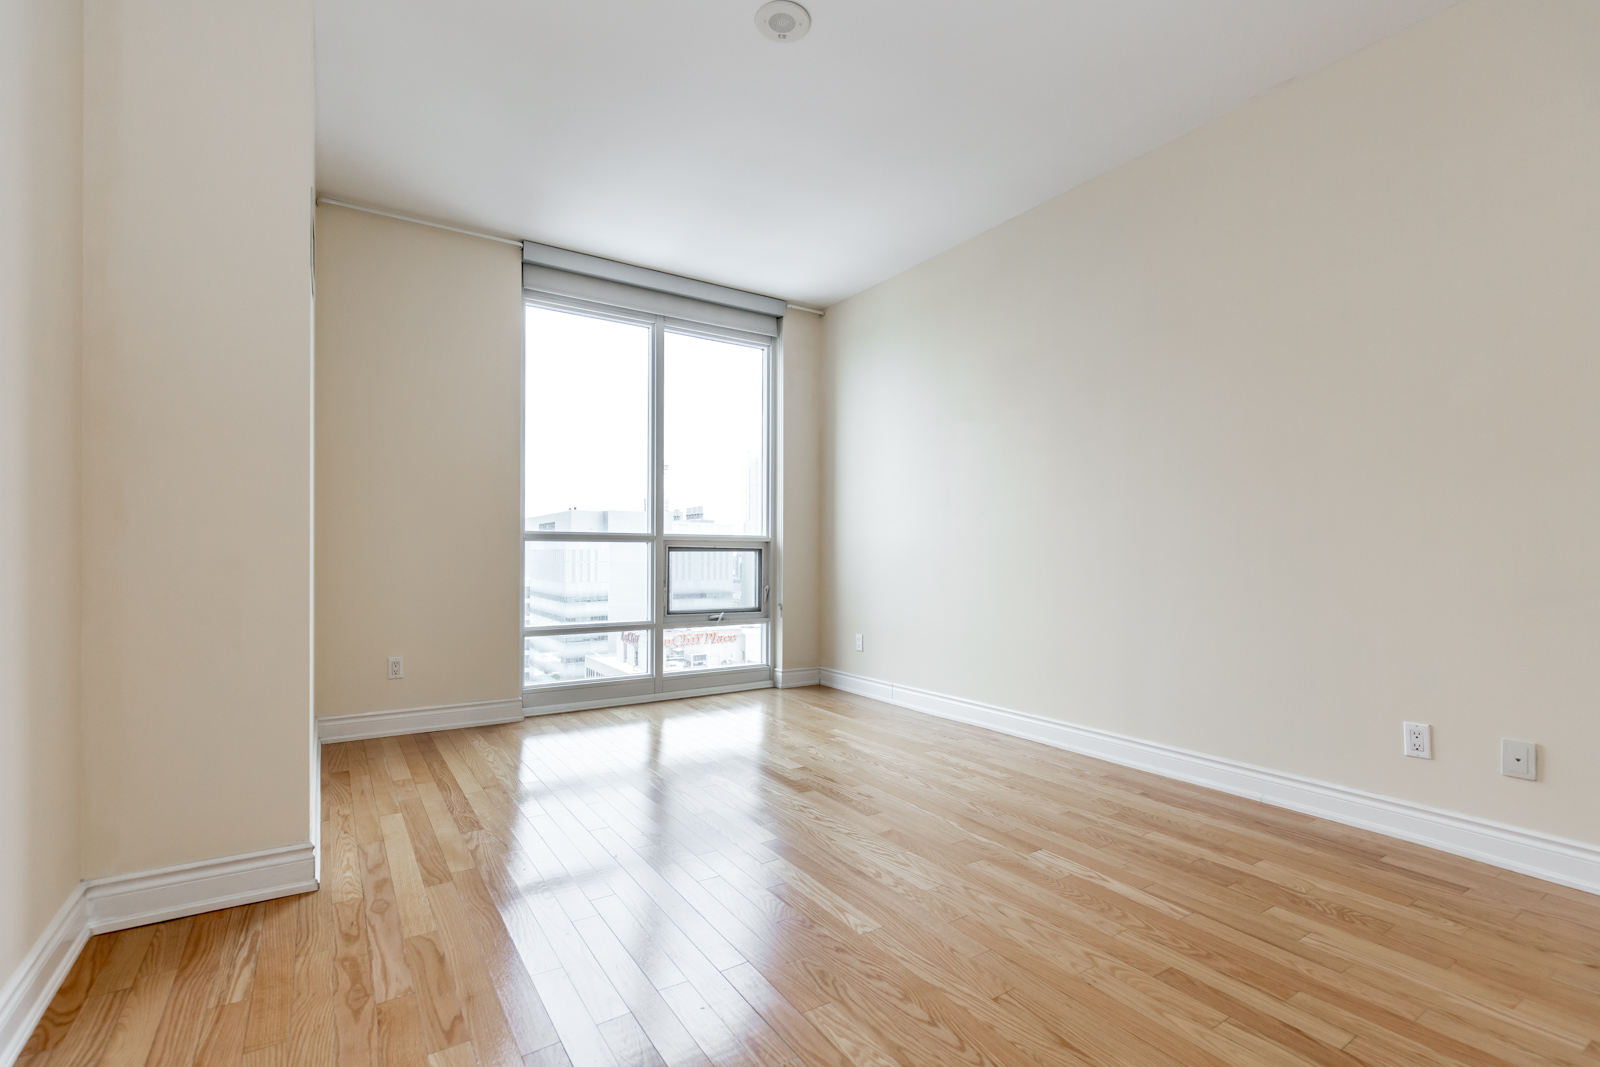 Photo of 761 Bay Street's master bedroom